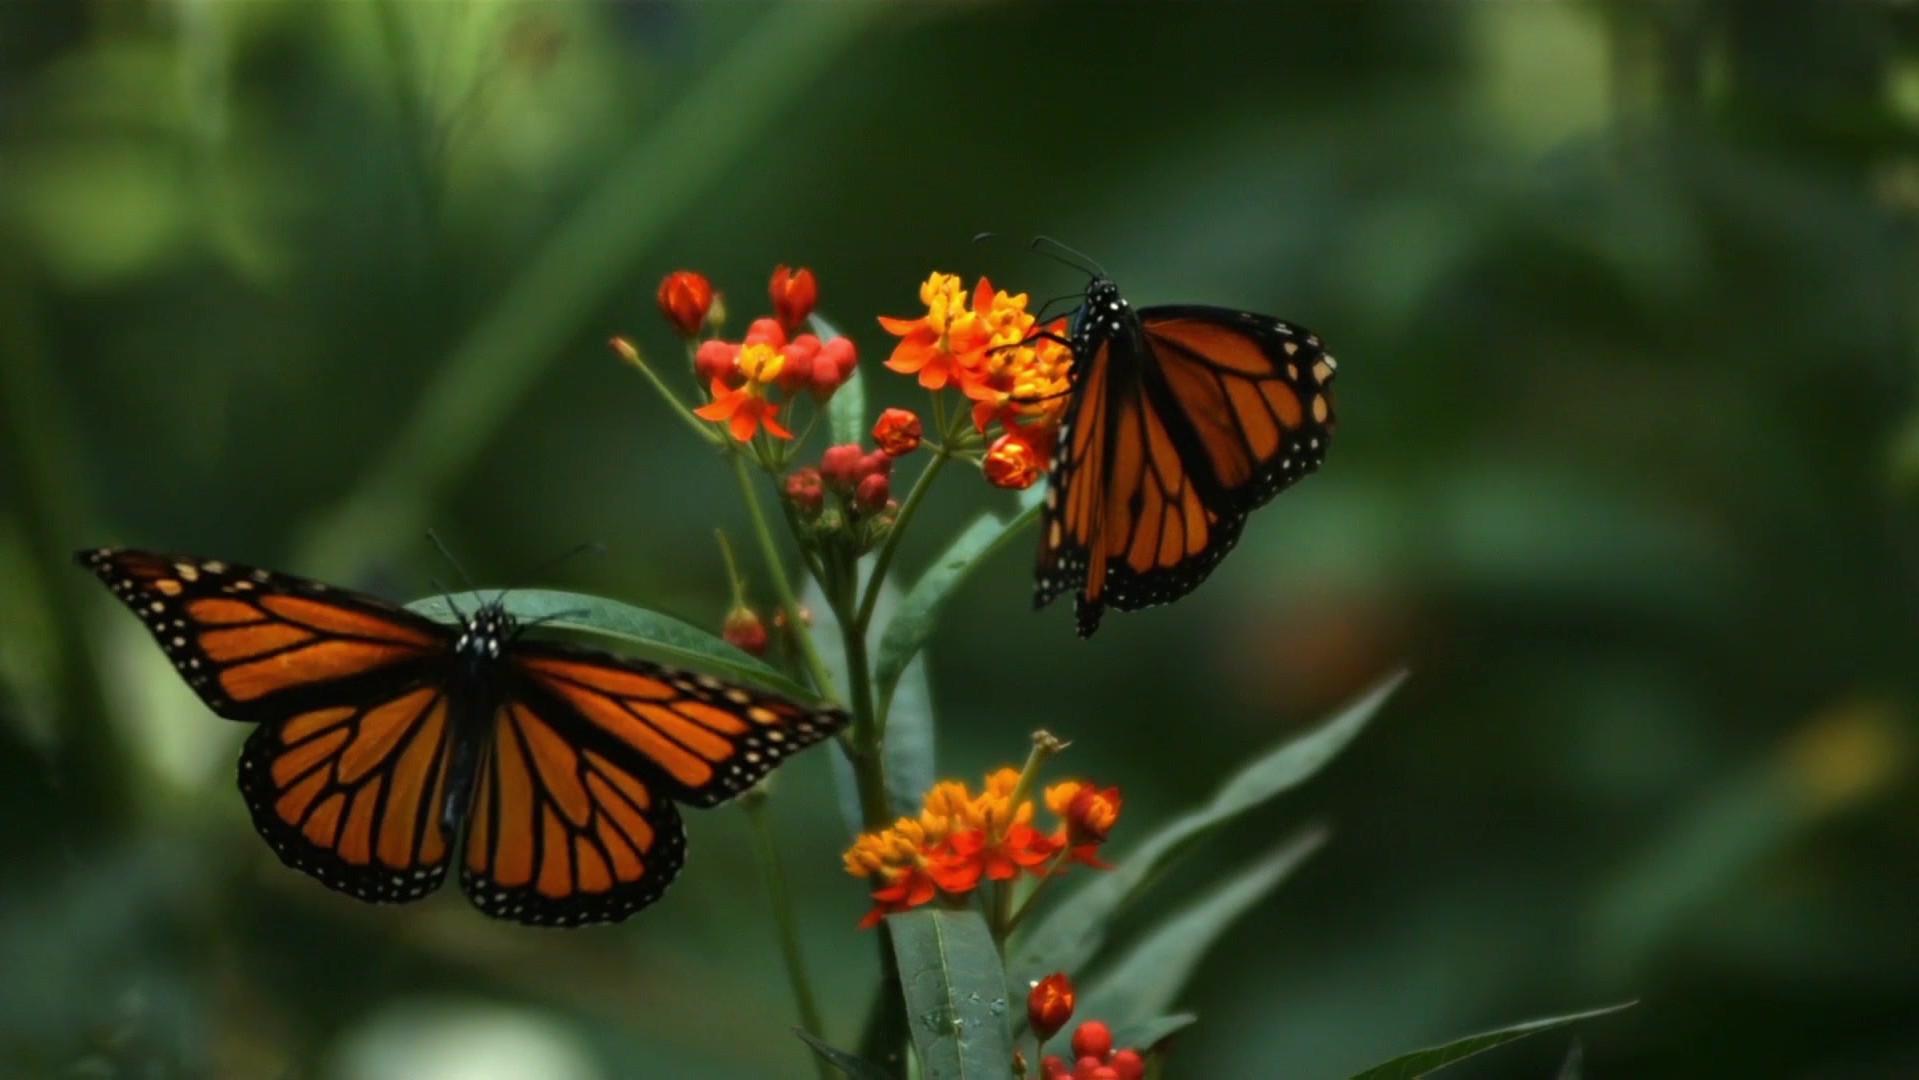 Two Beautiful Butterflies